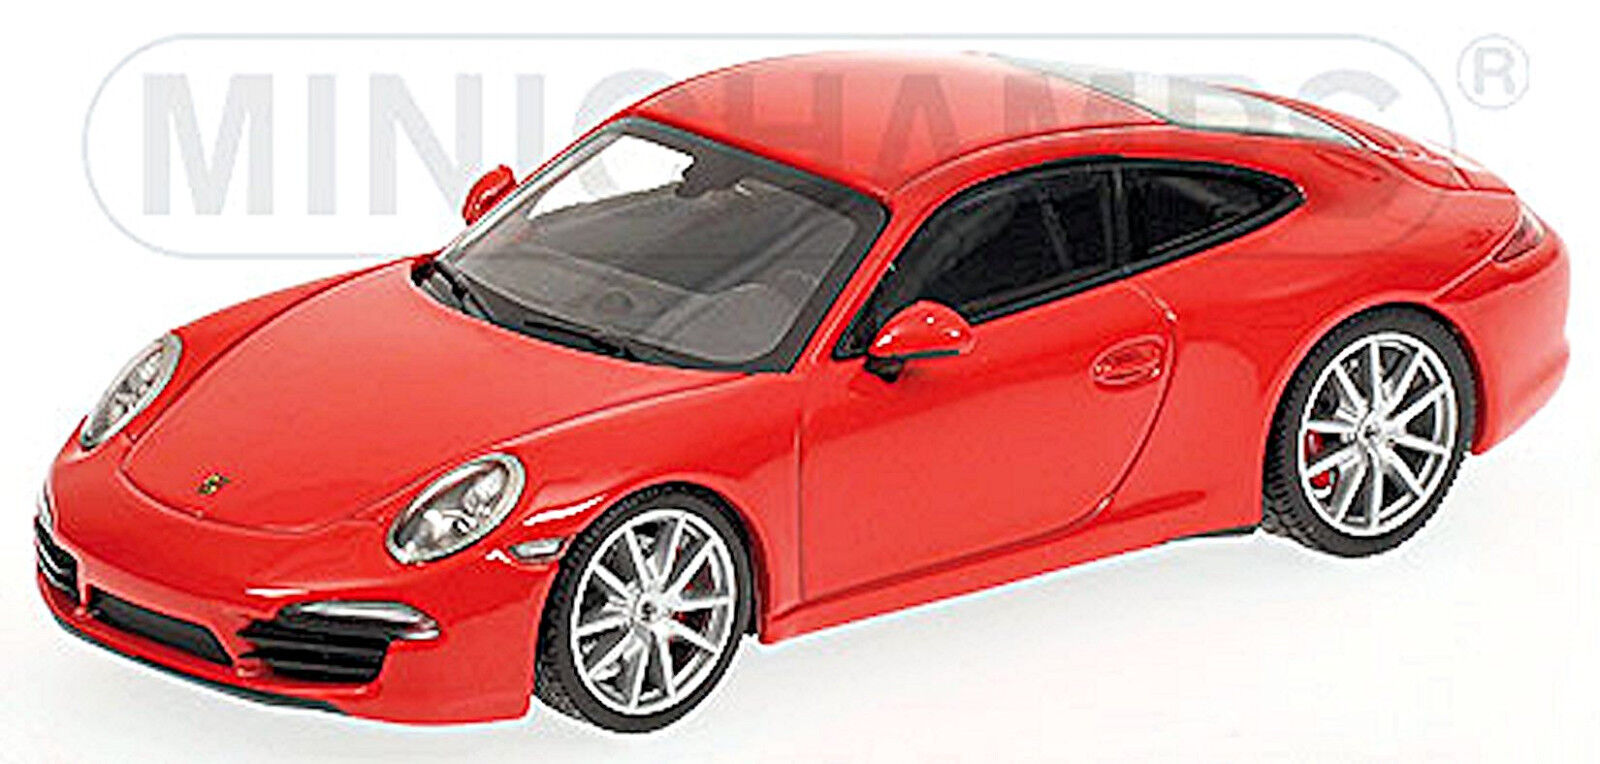 PORSCHE 911 Carrera S Tipo  991 COUPE 2012 terra indiana rojo 1 43 Minichamps